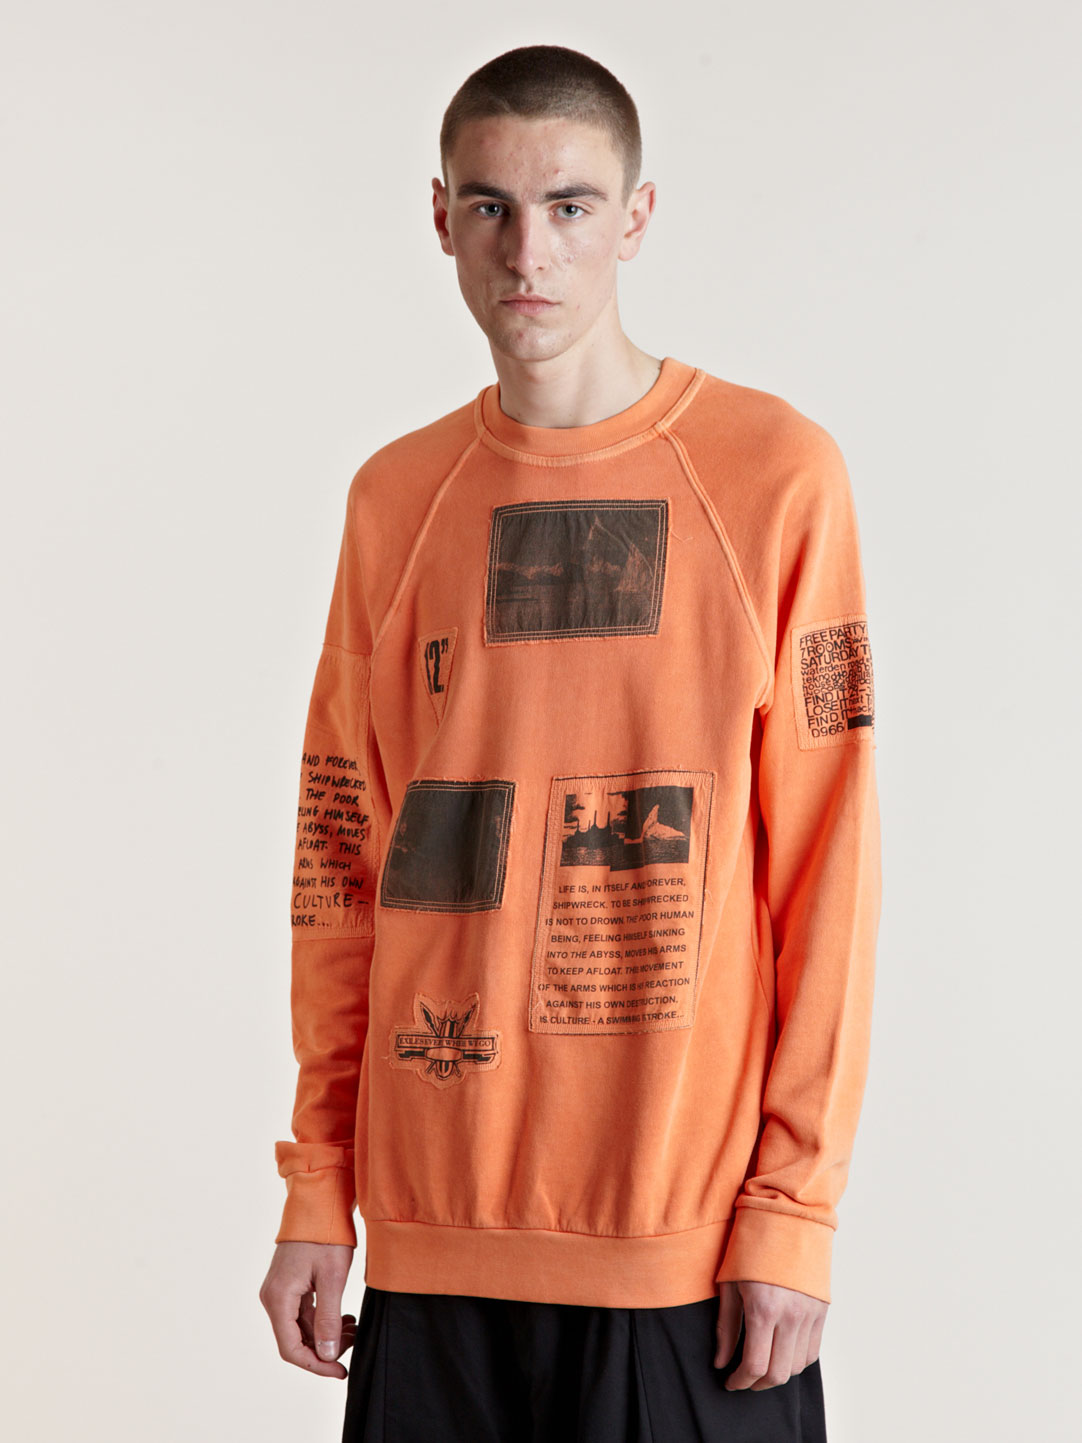 Raf Simons Aw04 Orange Patch Sweat In Orange For Men Lyst